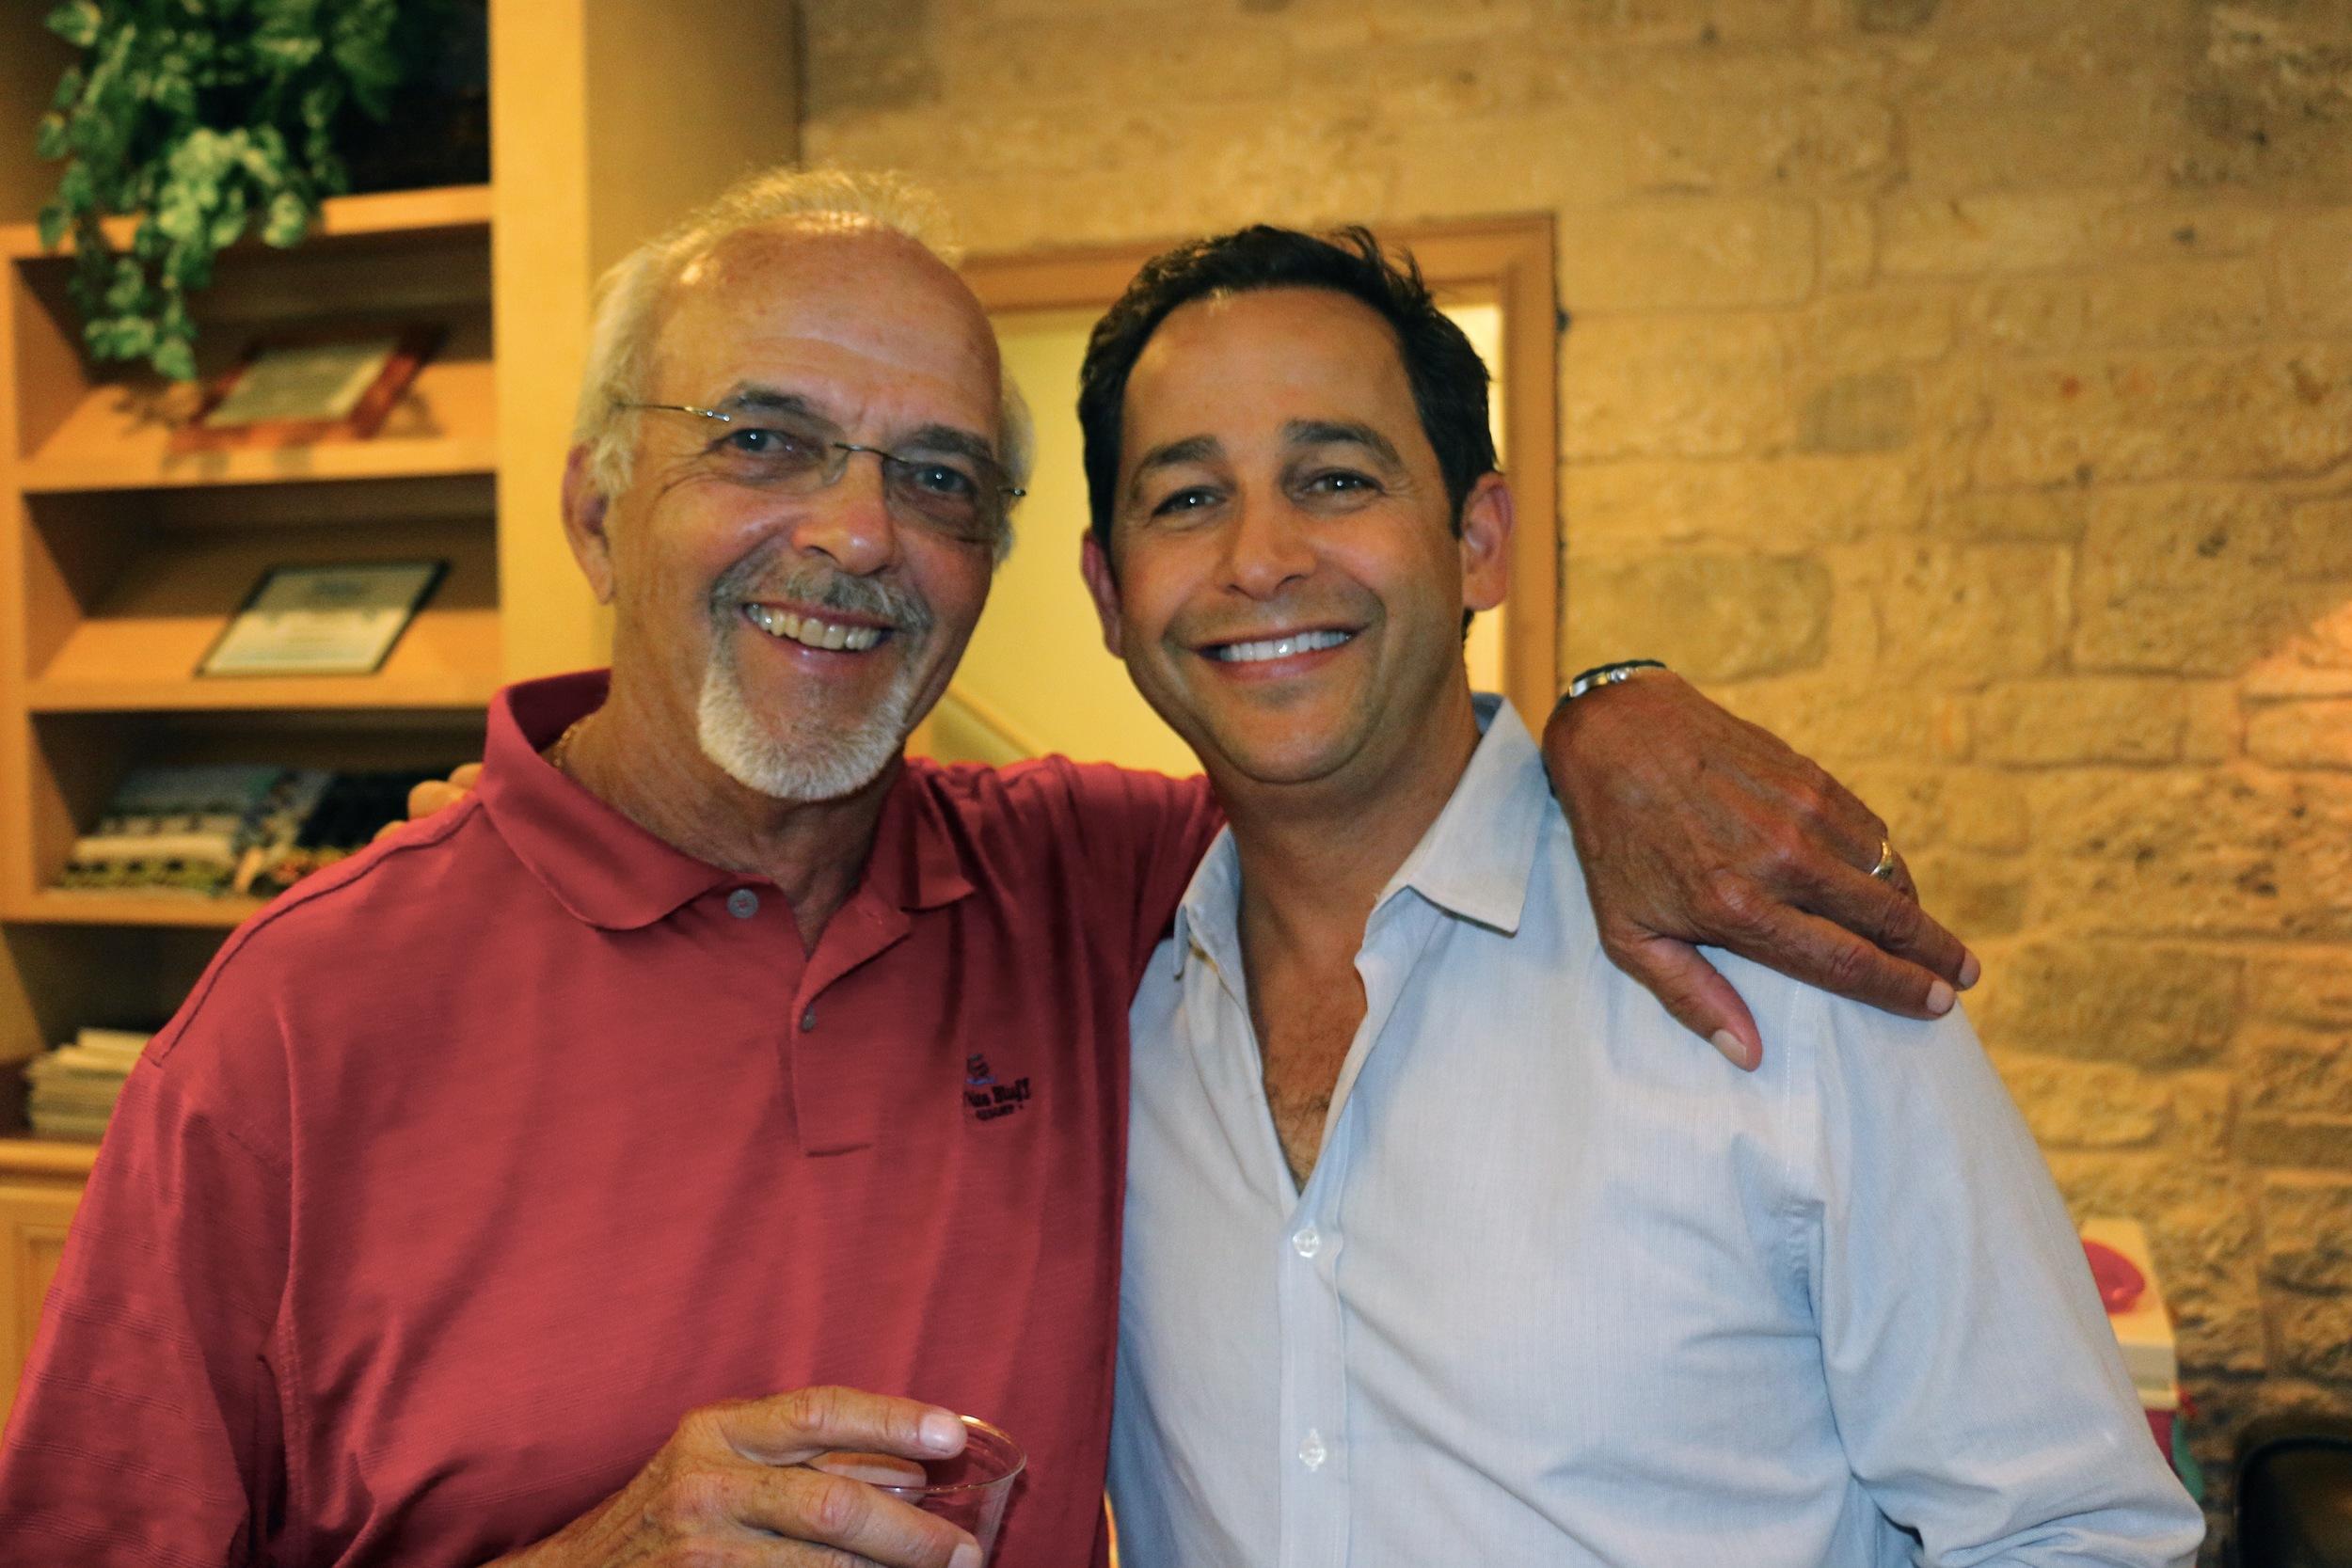 Drs. David Alger and Randy Kunik